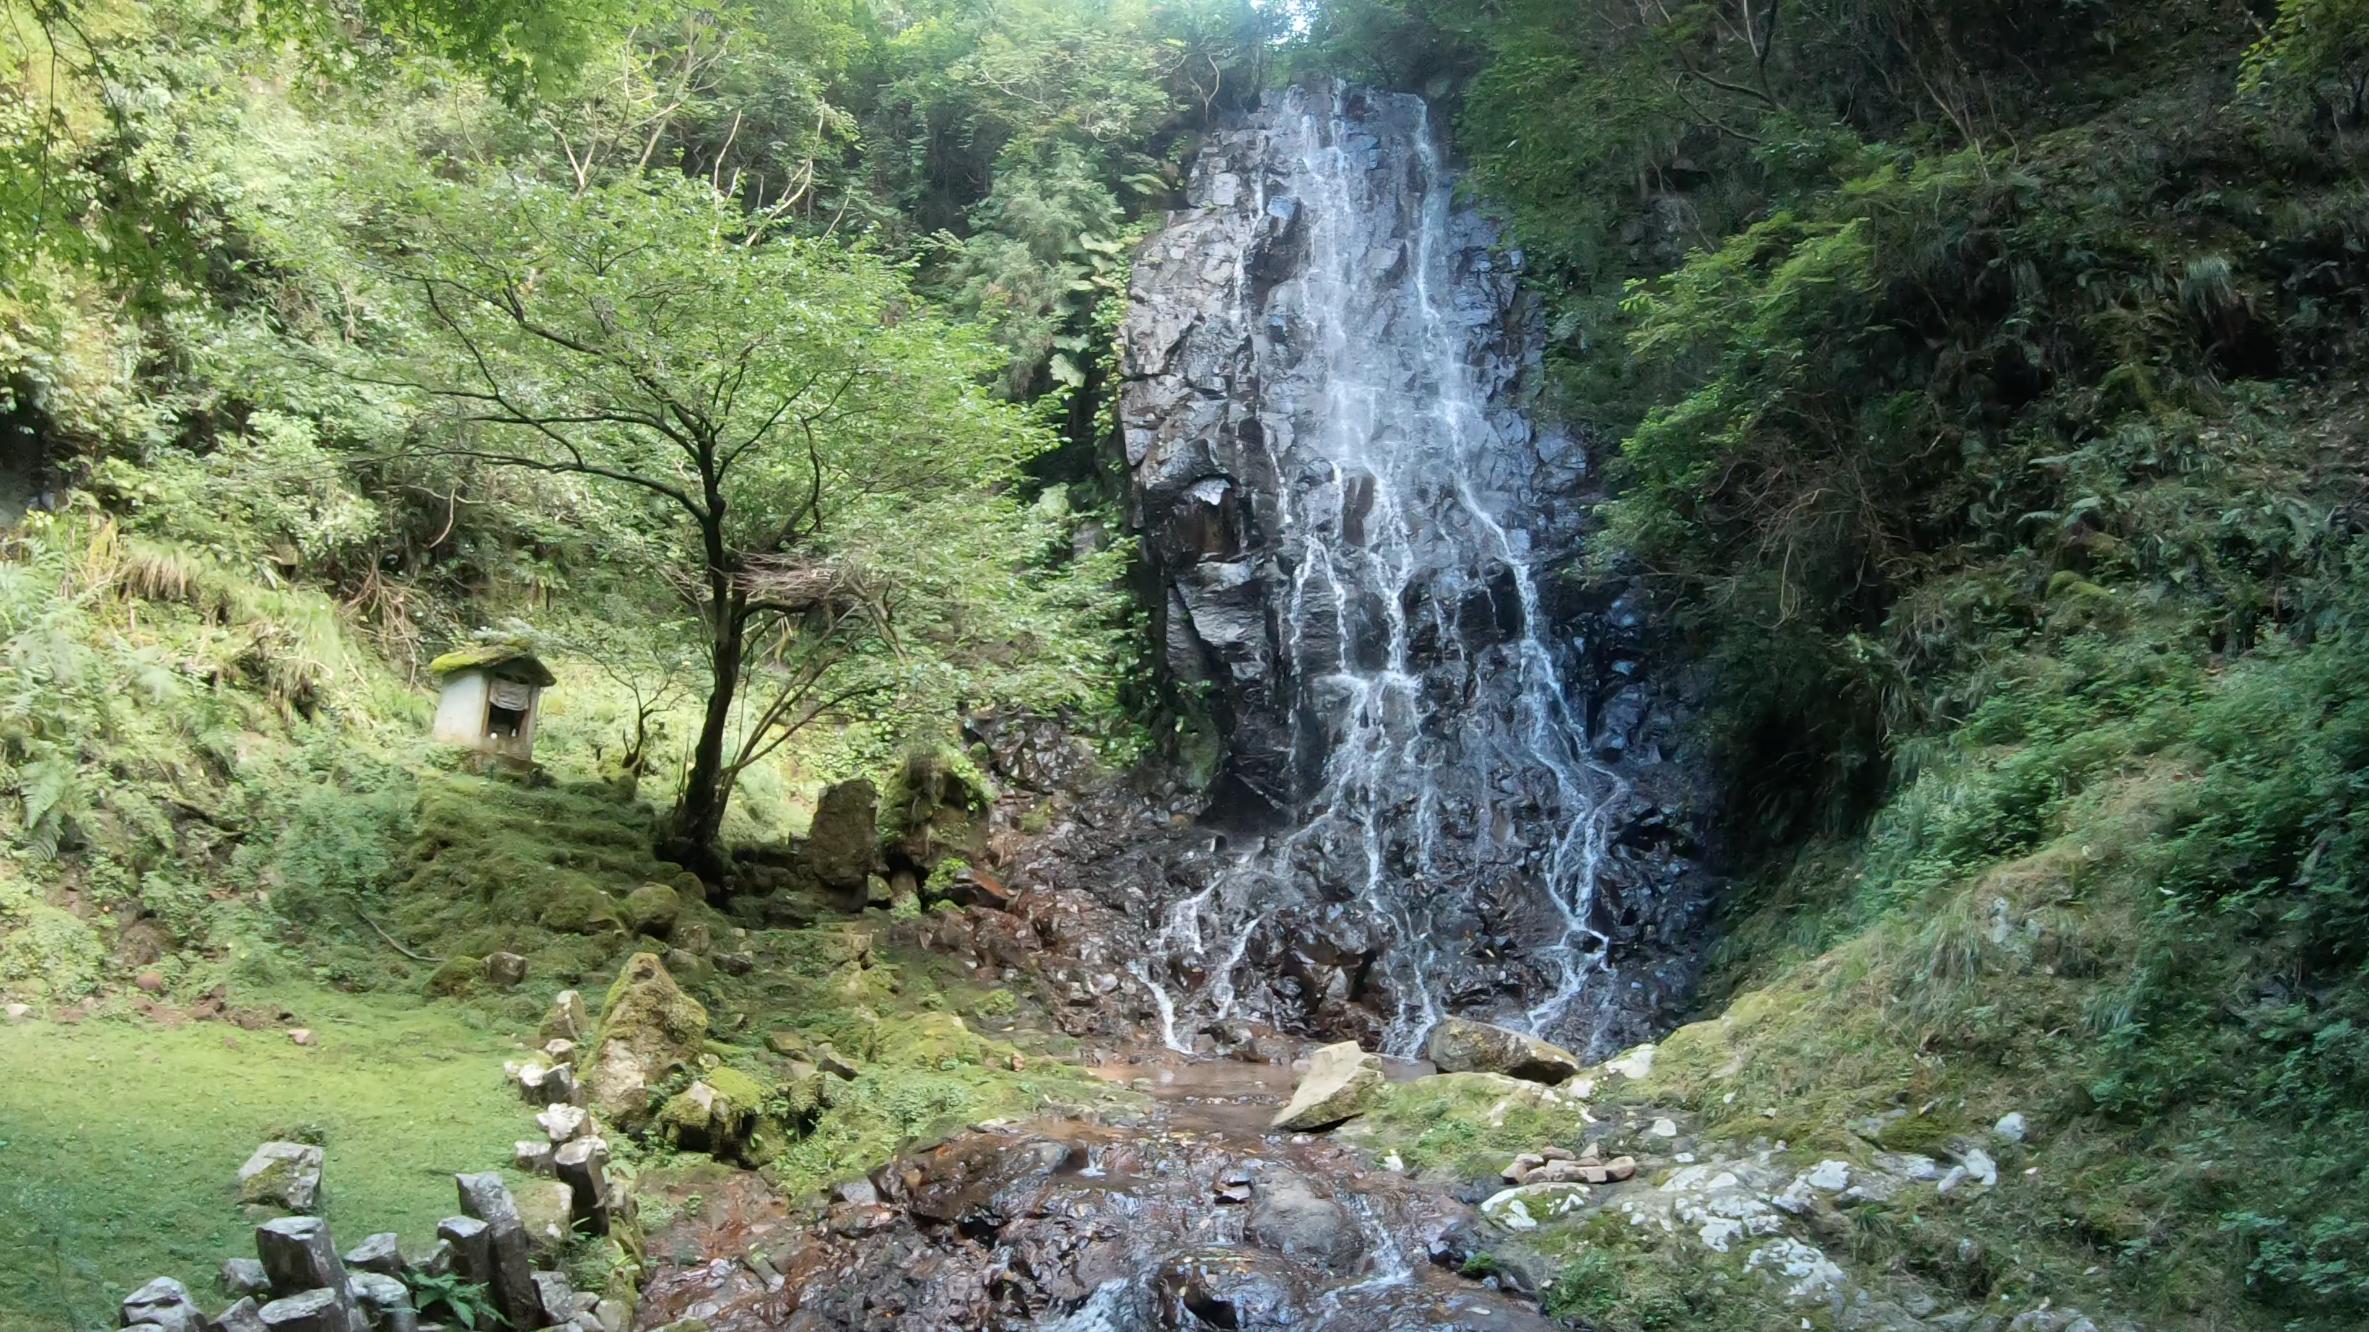 c774f001531dda21fb9e61b848a857cc 京都府    霧降りの滝 ( 京都の丹後半島観光におすすめ! 滝が観れる撮影スポット! アクセス・駐車場情報や撮影ポイントなど!!)